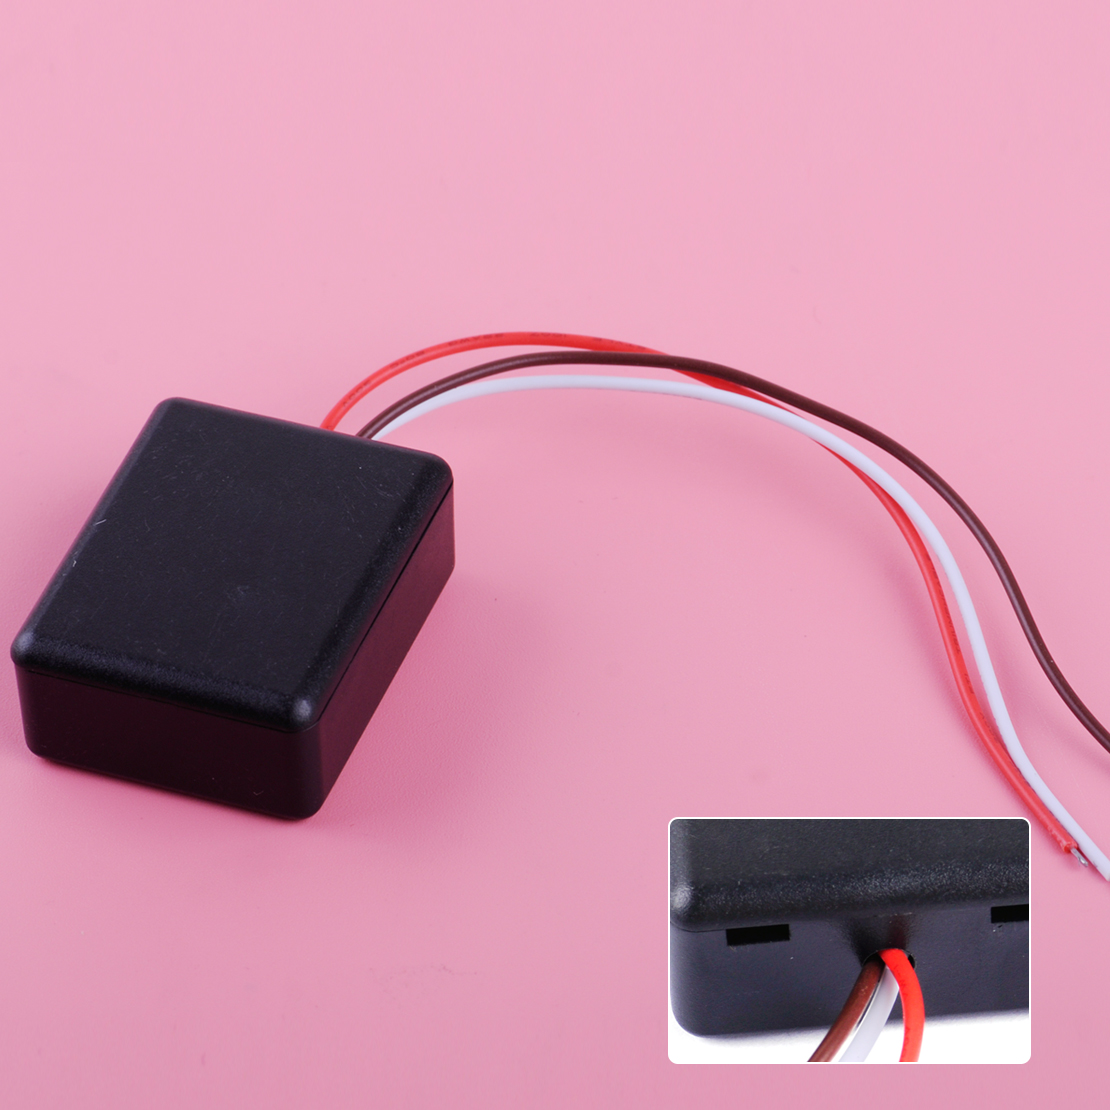 Citall Car Occupancy Seat Sensor Srs Emulator Fit For Mercedes Benz Wiring Diagram W168 W163 W203 W210 W220 On Alibaba Group